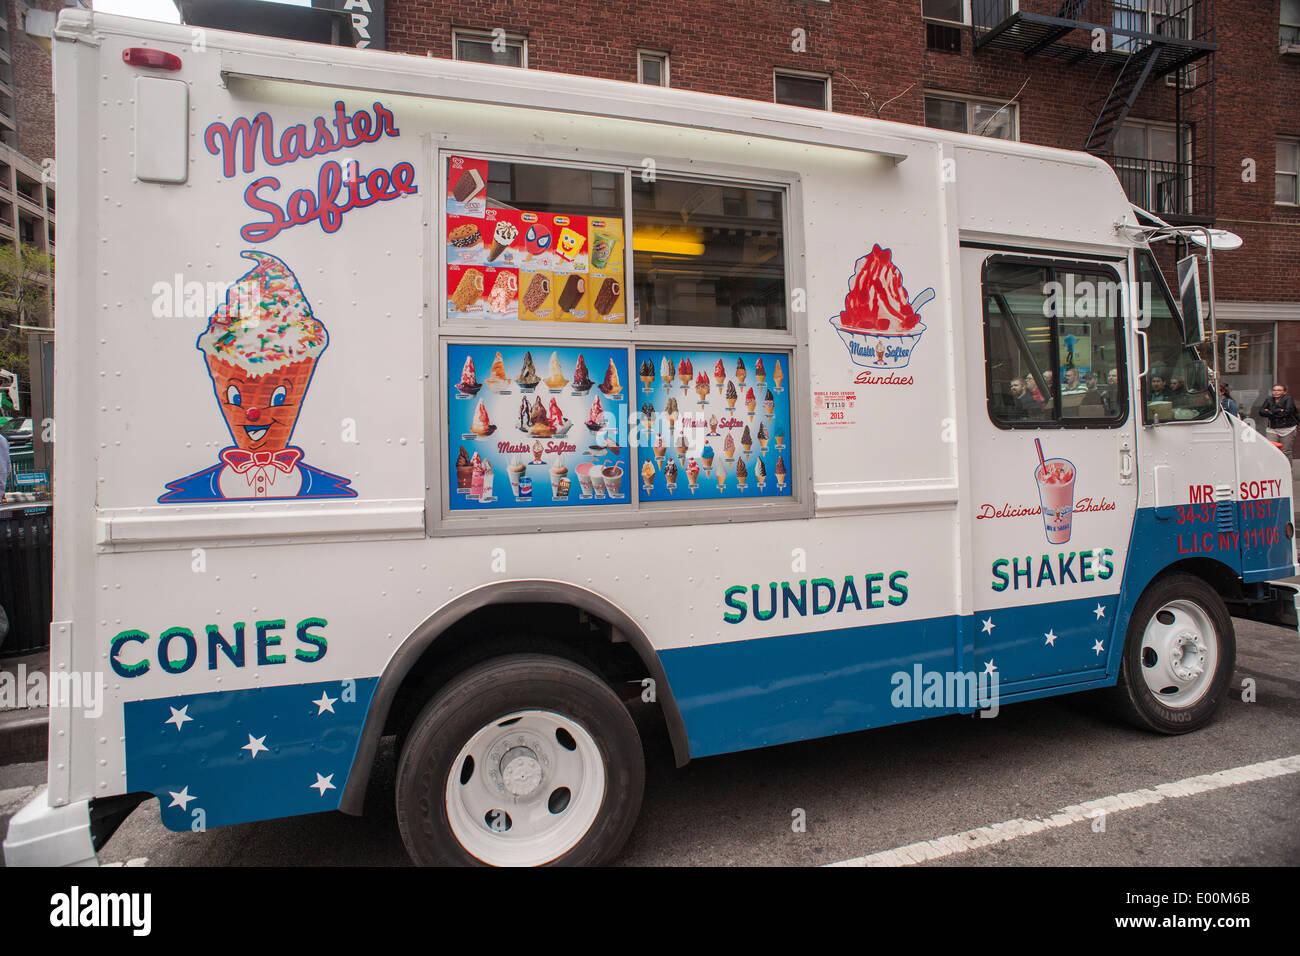 Ice Cream Truck Mr Softee A Master Softee...